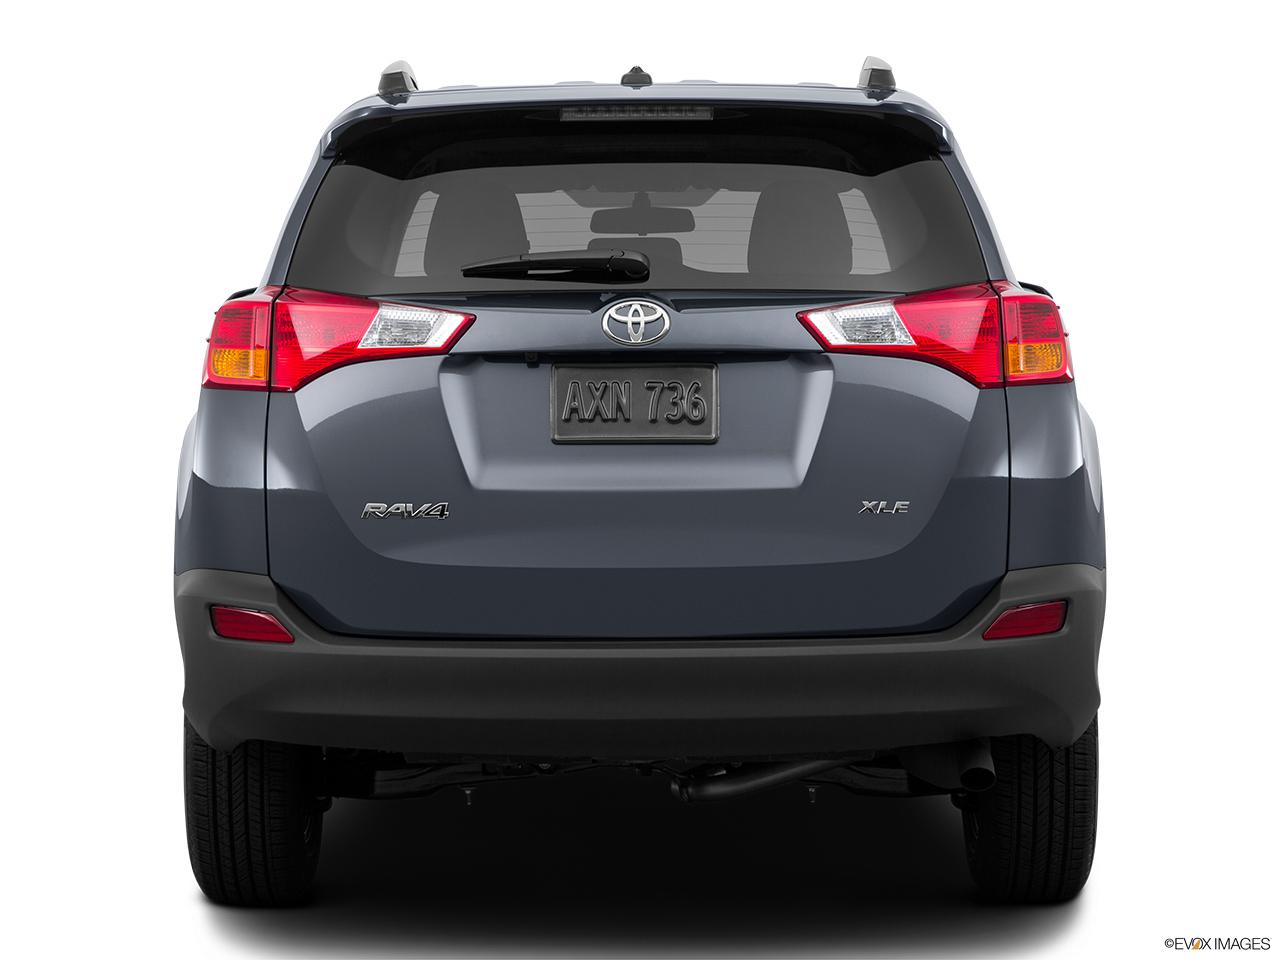 2015 Toyota Rav4 Awd 4 Door Xle Front Angle View. 2015 Toyota Rav4 Awd 4 Door Xle Lowwide Rear. Toyota. 2013 Toyota Rav4 Drivetrain Diagram At Scoala.co